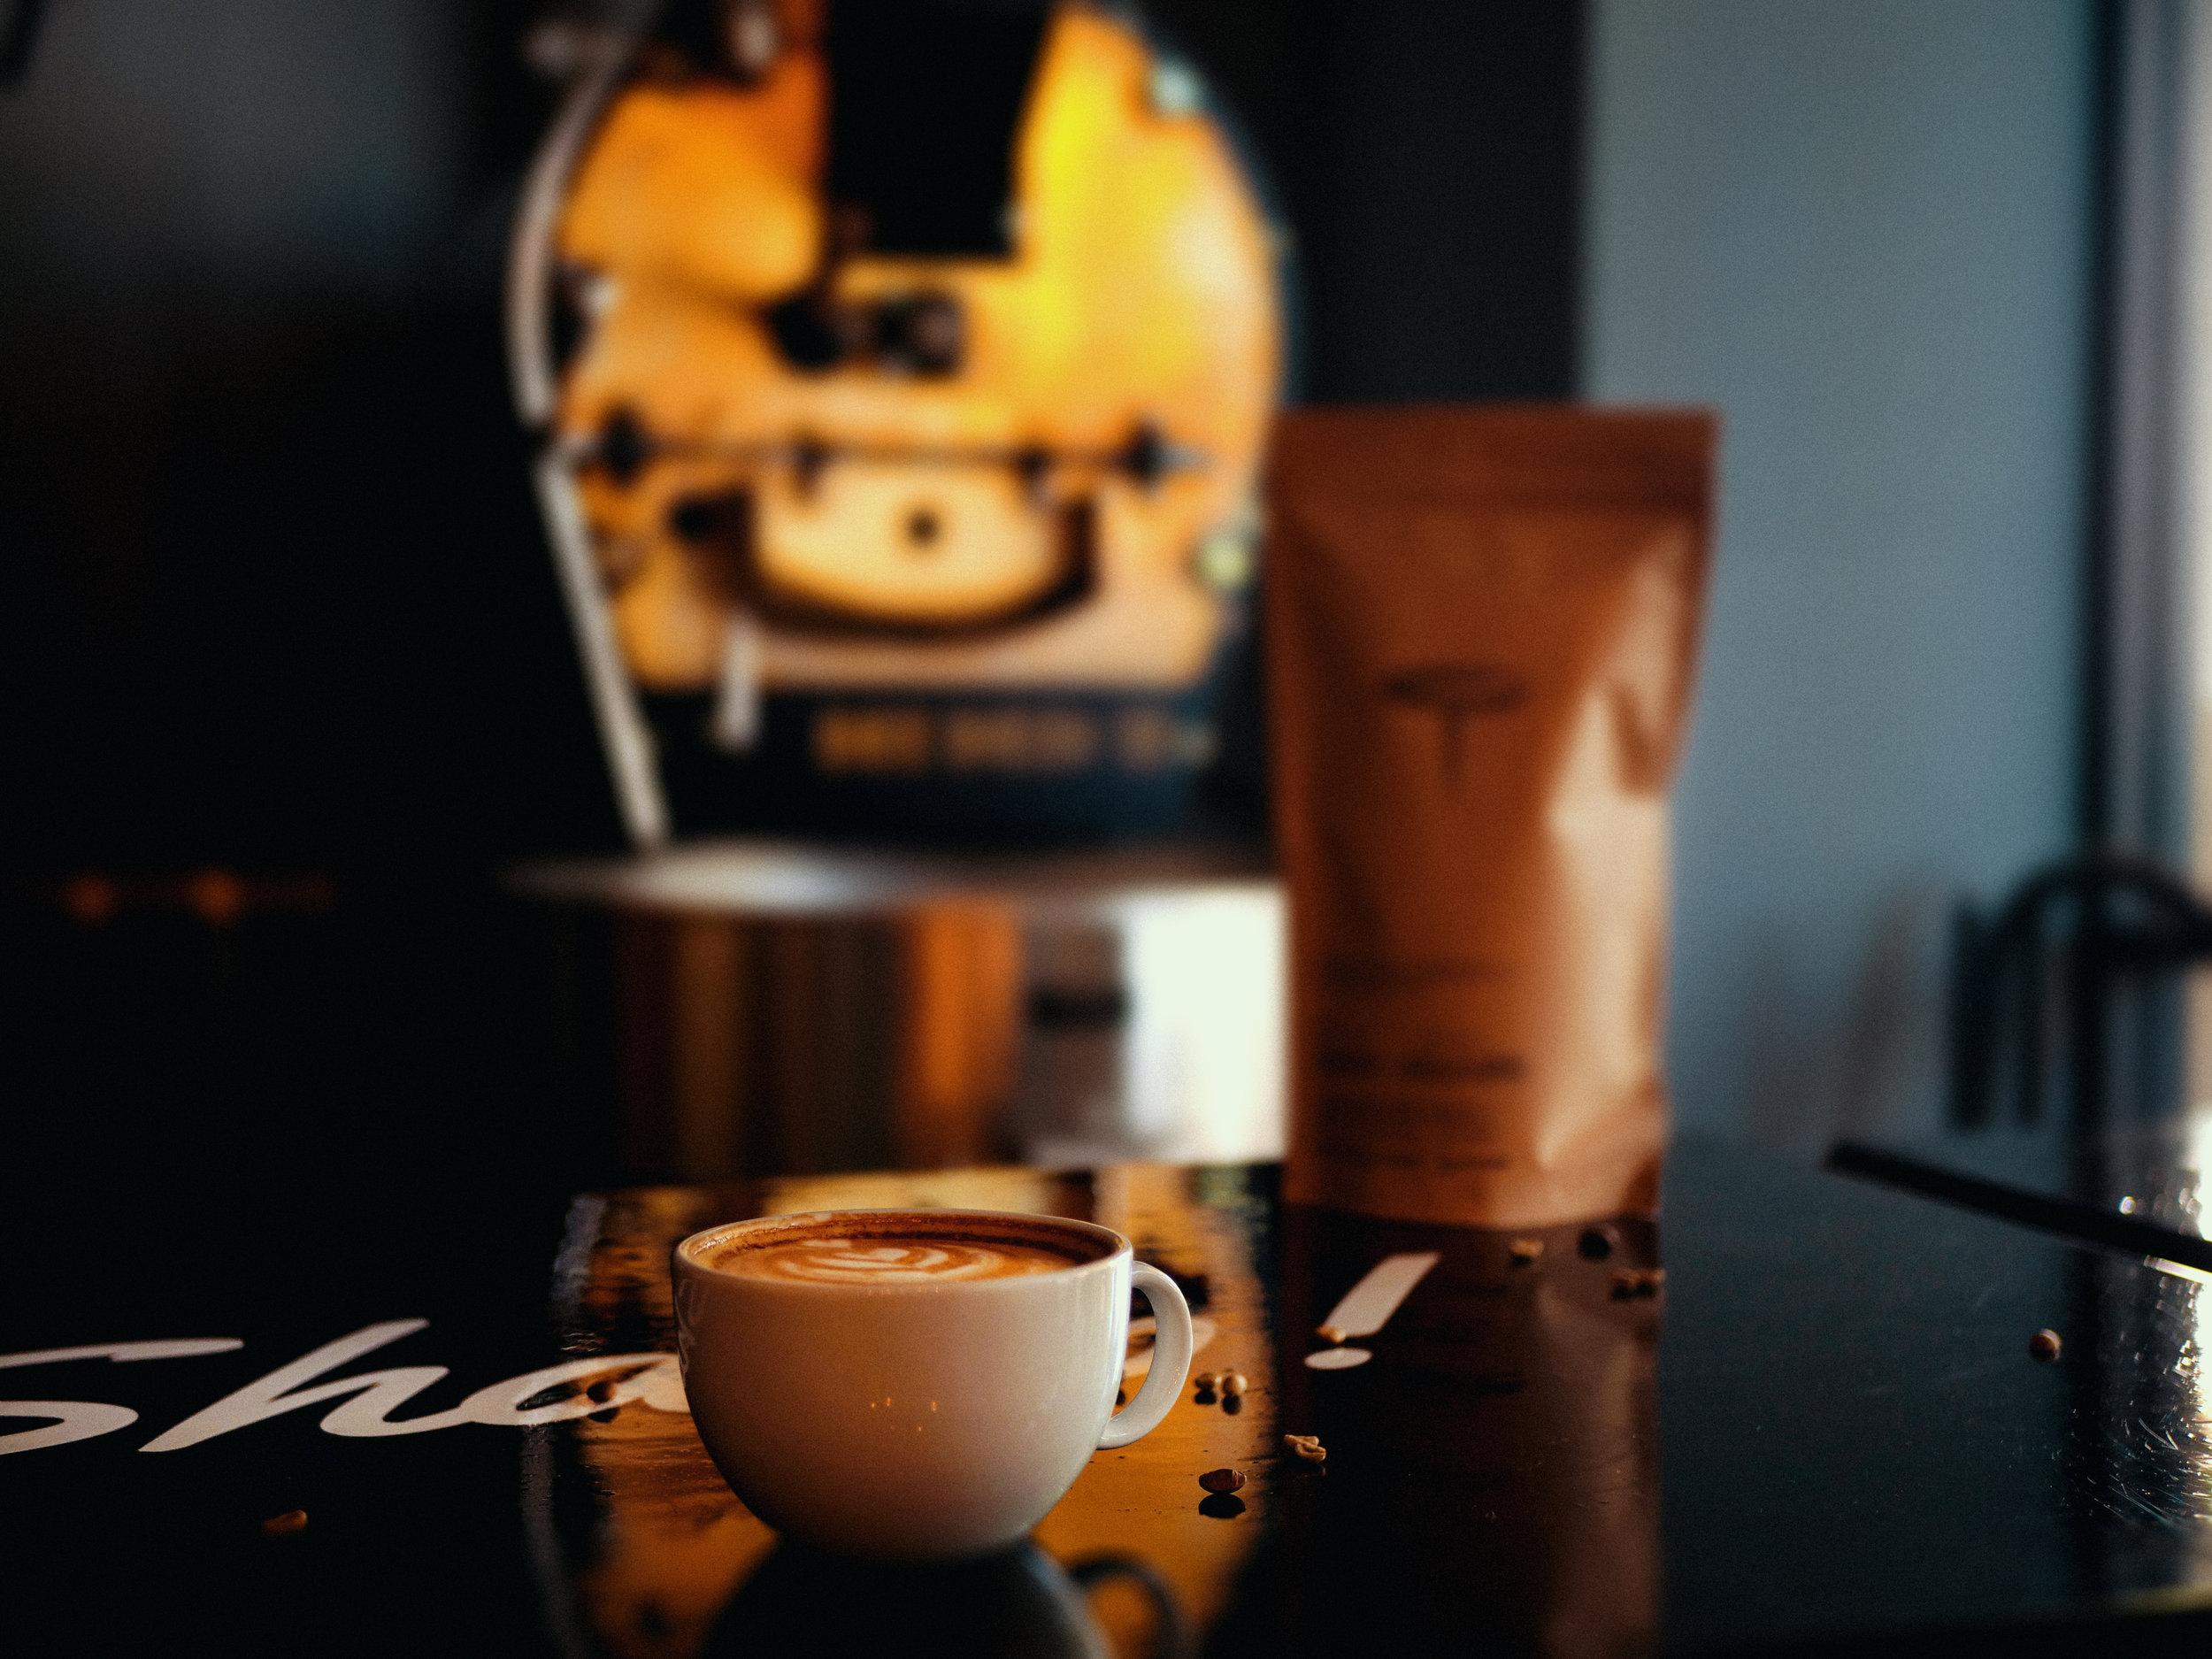 Brass Tacks Coffee Co. Roastery - 318 Ferris Street, Green Cove Springs FL, 32043General email: info@brasstackscoffee.comWholesale email: justin@brasstackscoffee.comRoaster email: brandon@brasstackscoffee.com